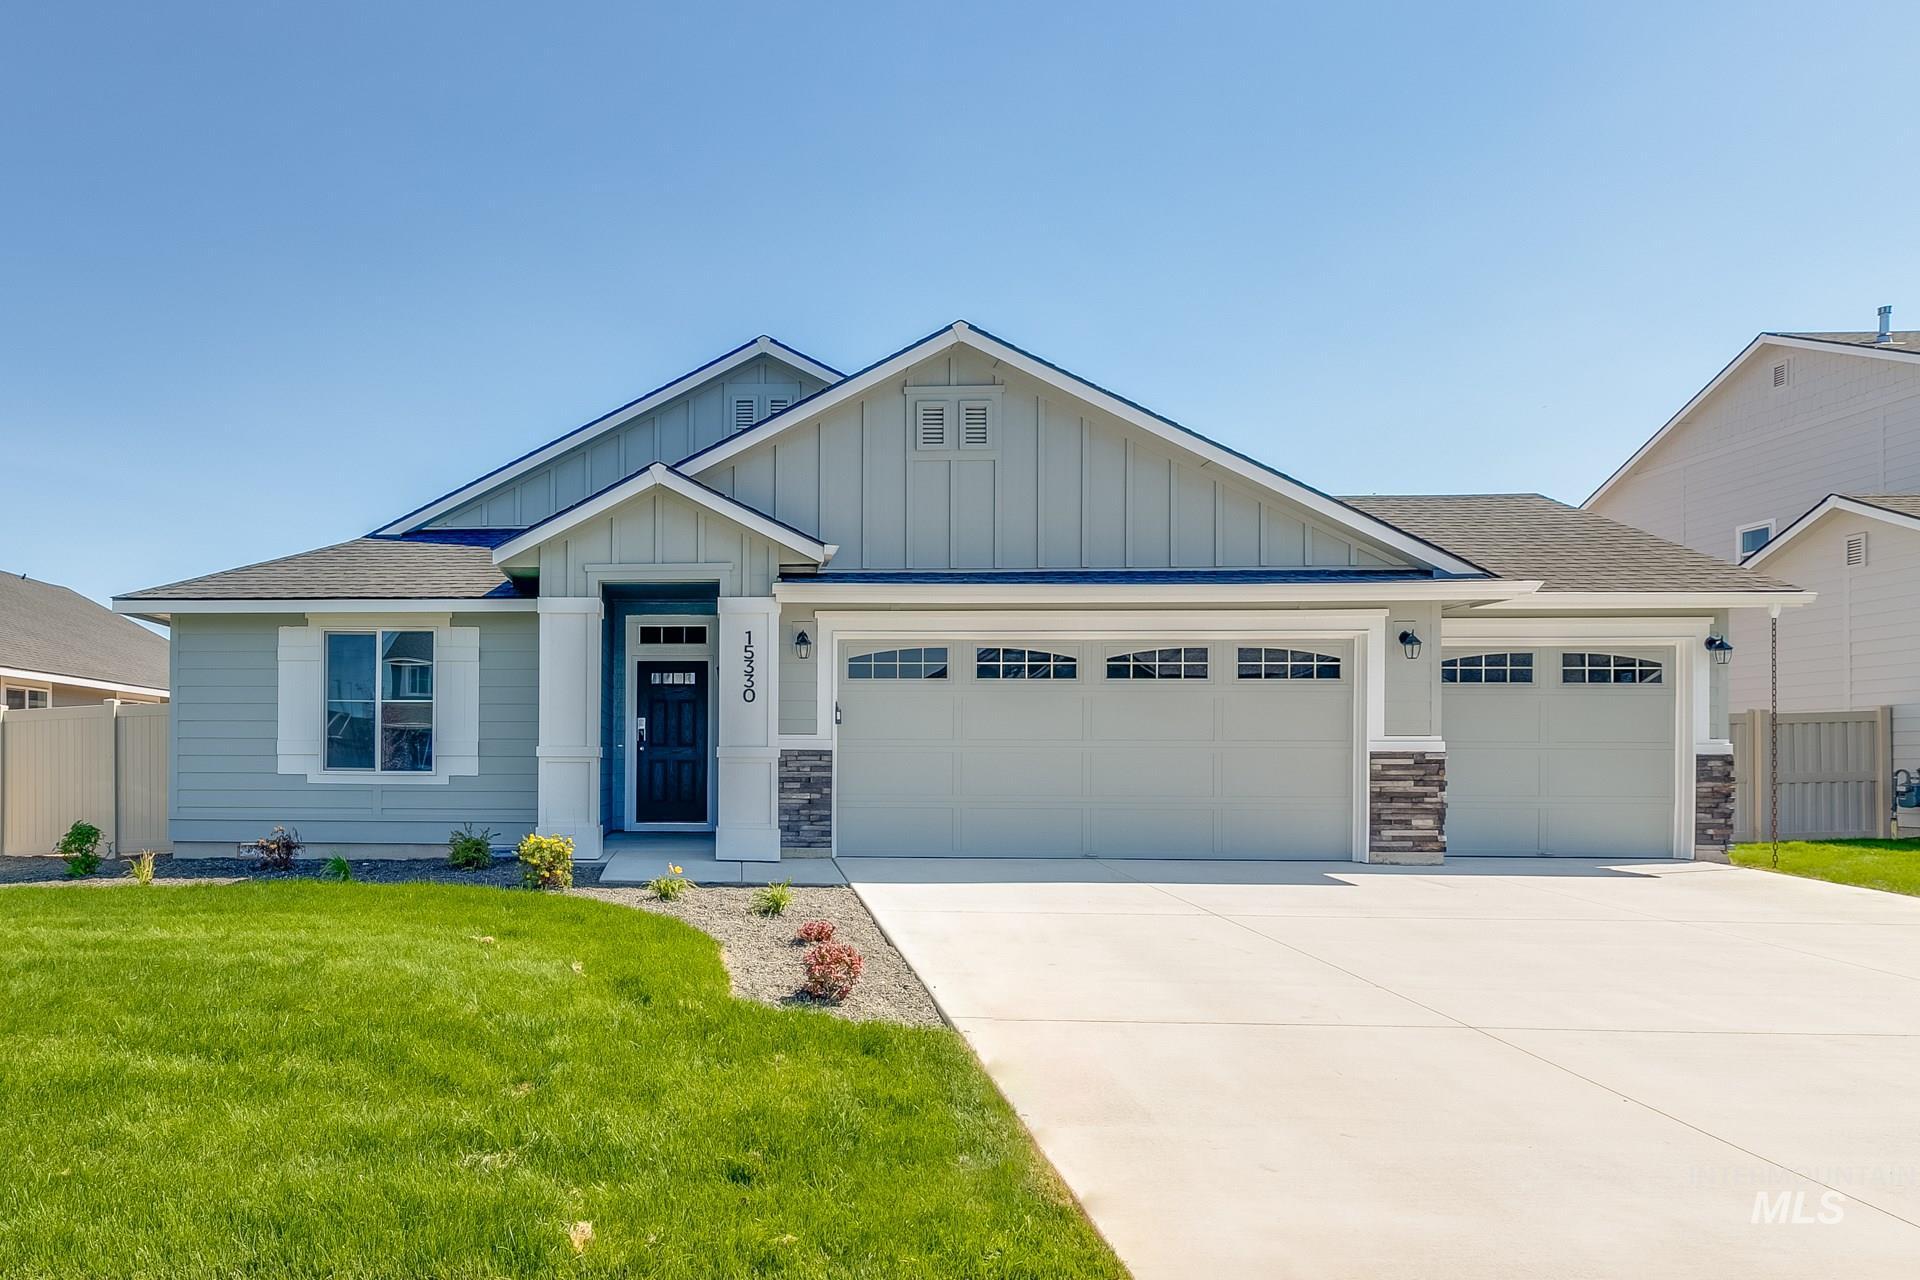 726 W Nannyberry St Property Photo - Kuna, ID real estate listing